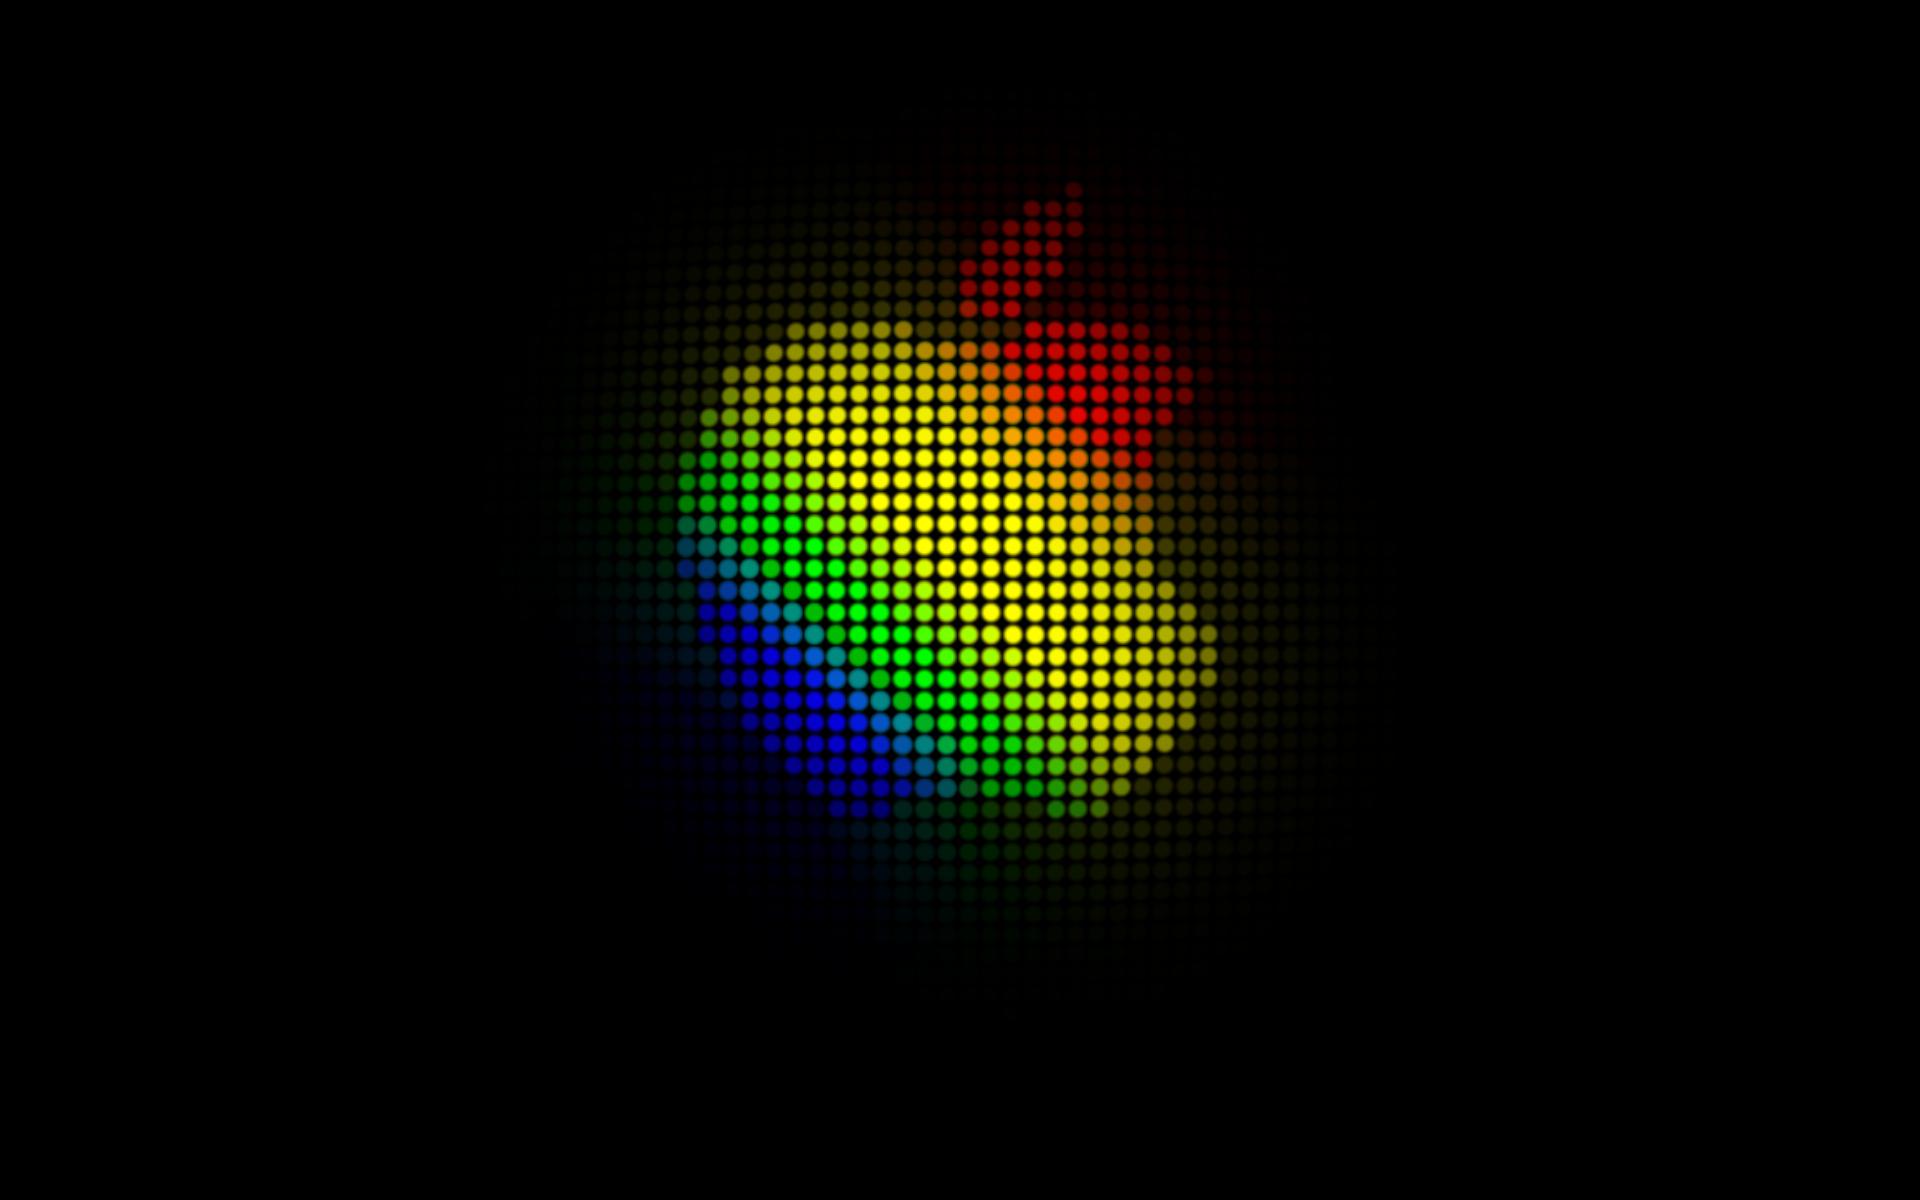 Skyrim Iphone X Wallpaper Apple Logo Disco Style Full Hd Fond D 233 Cran And Arri 232 Re